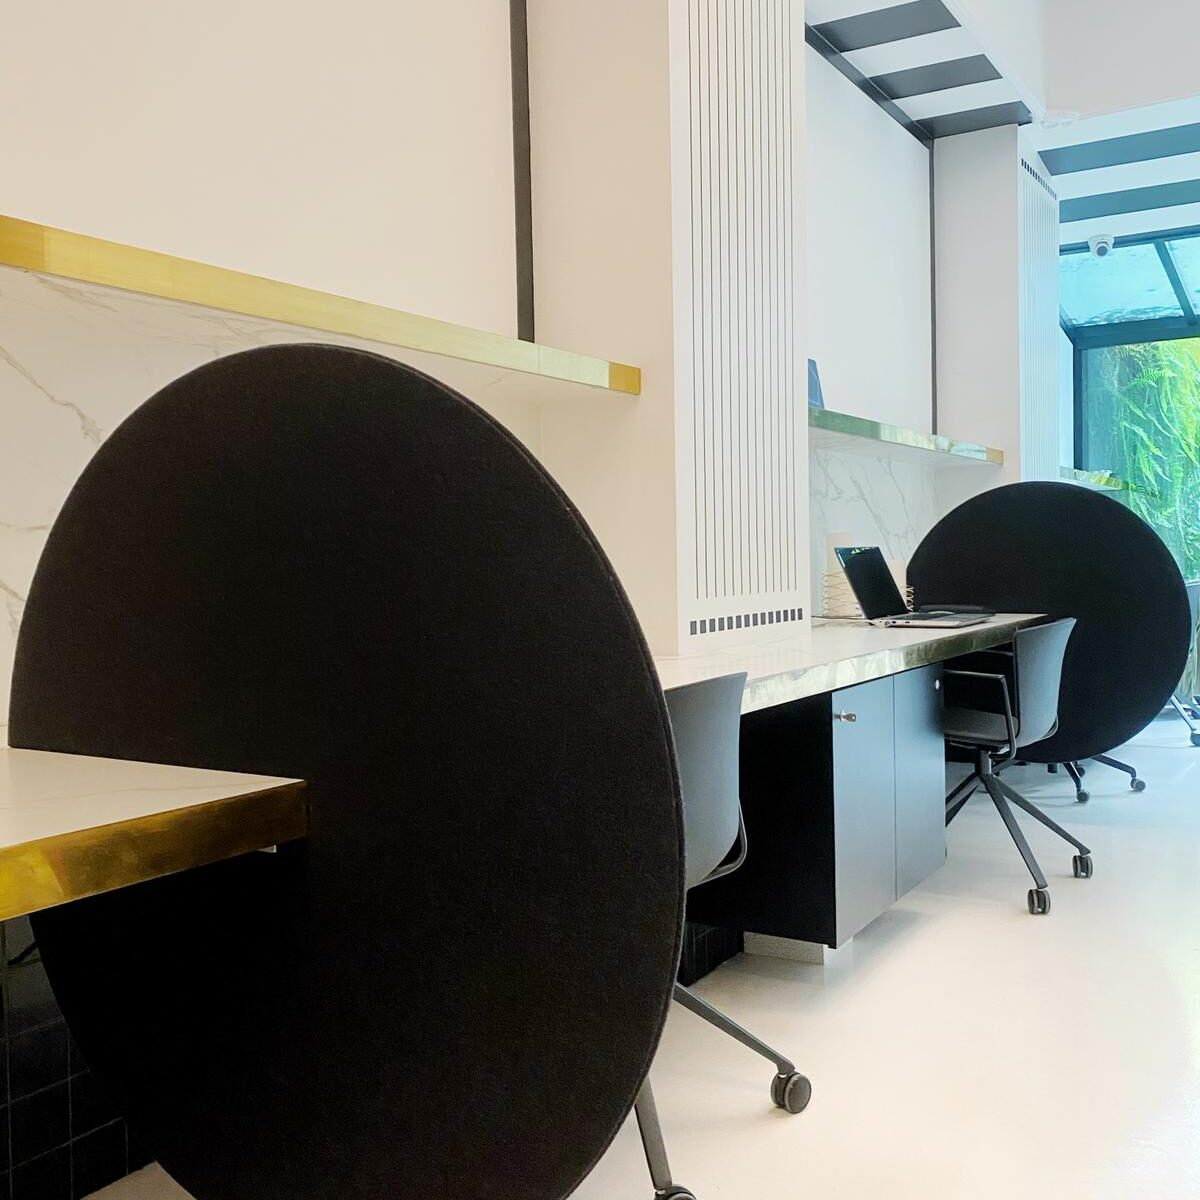 Tiovivo espacio coworking en Valencia adaptado al coronavirus